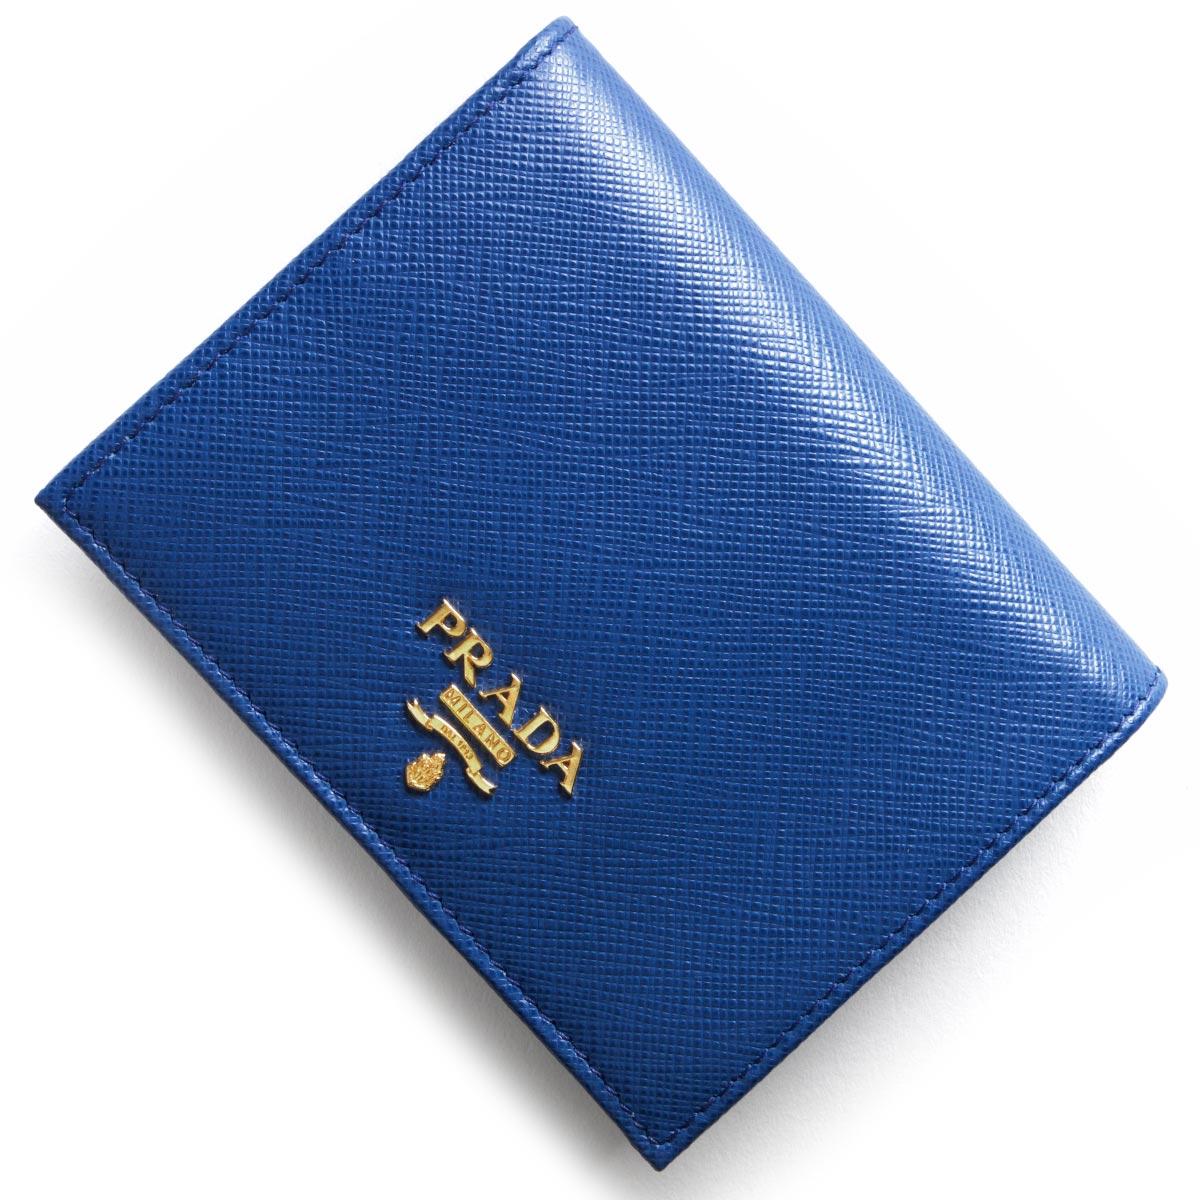 a877b087bd30 プラダ PRADA 二つ折り財布 サフィアーノ メタル SAFFIANO METAL ...